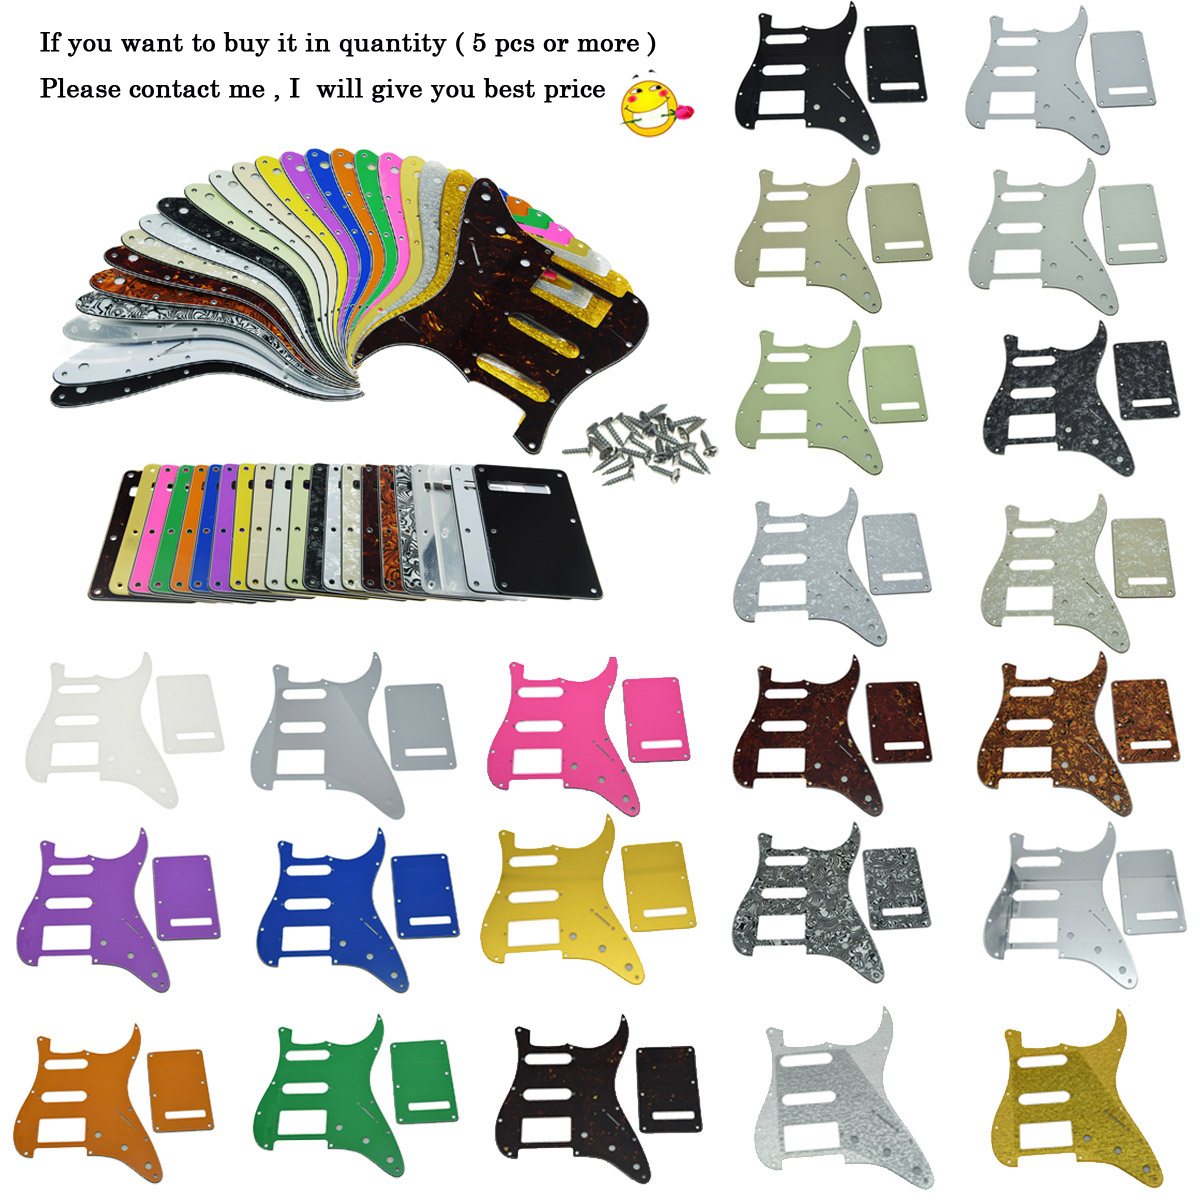 Dopro ST Style HSS Guitar Pickguard Scratch Plate,Trem Cover, Screws Various colors